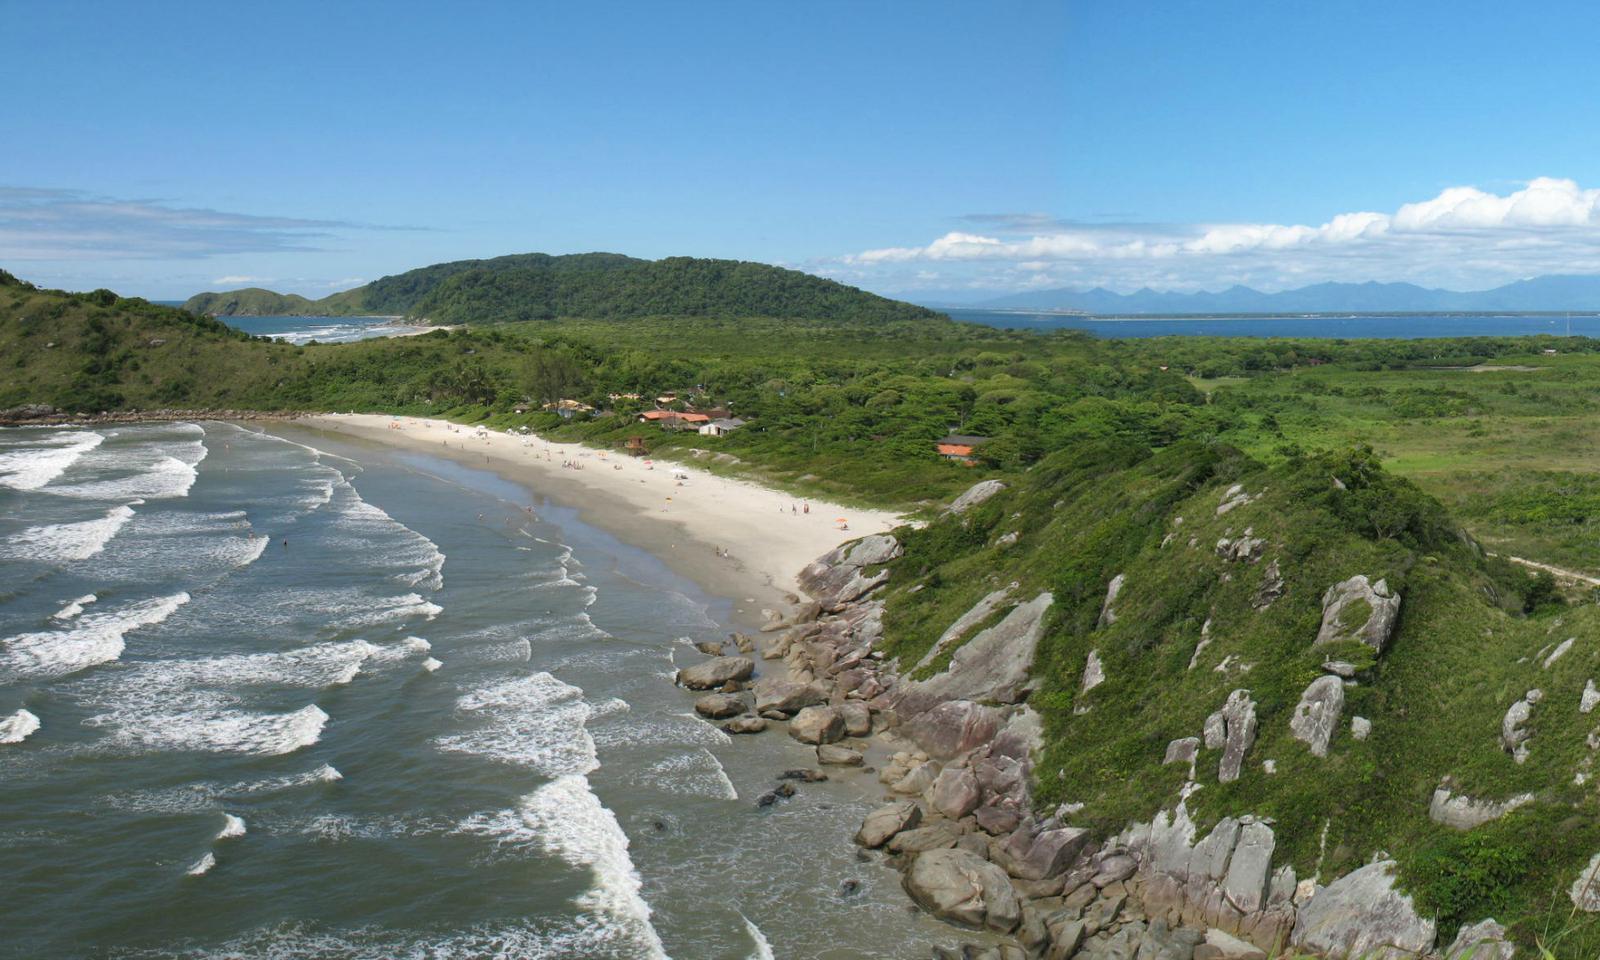 ilha-do-mel-Luiza-Libardi-flickr